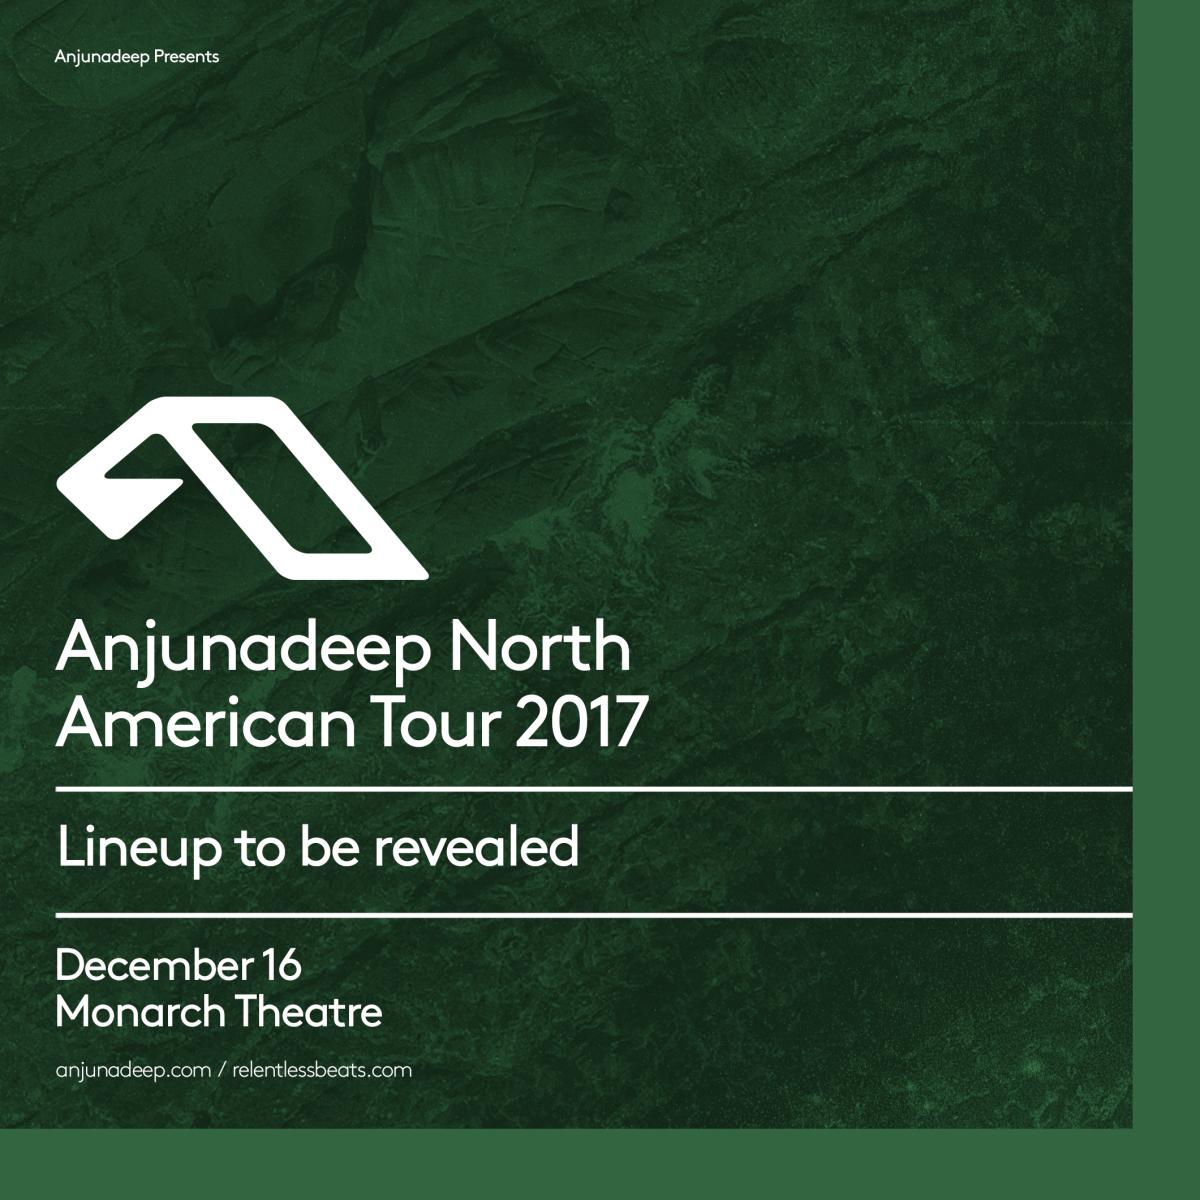 Flyer for Anjunadeep North American Tour 2017